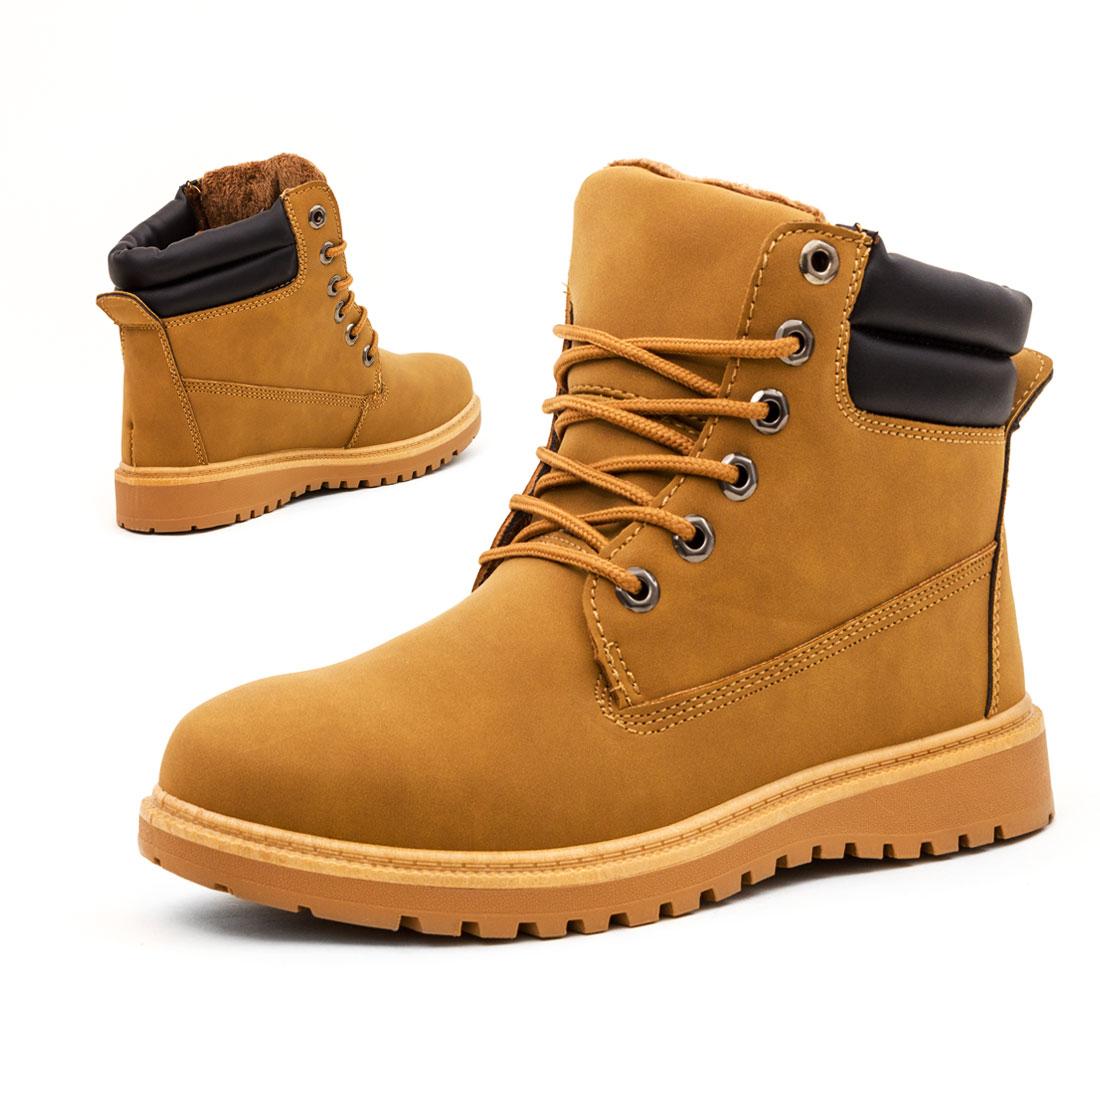 unisex damen herren schn r winter schuhe stiefeletten boots lederoptik gef ttert ebay. Black Bedroom Furniture Sets. Home Design Ideas